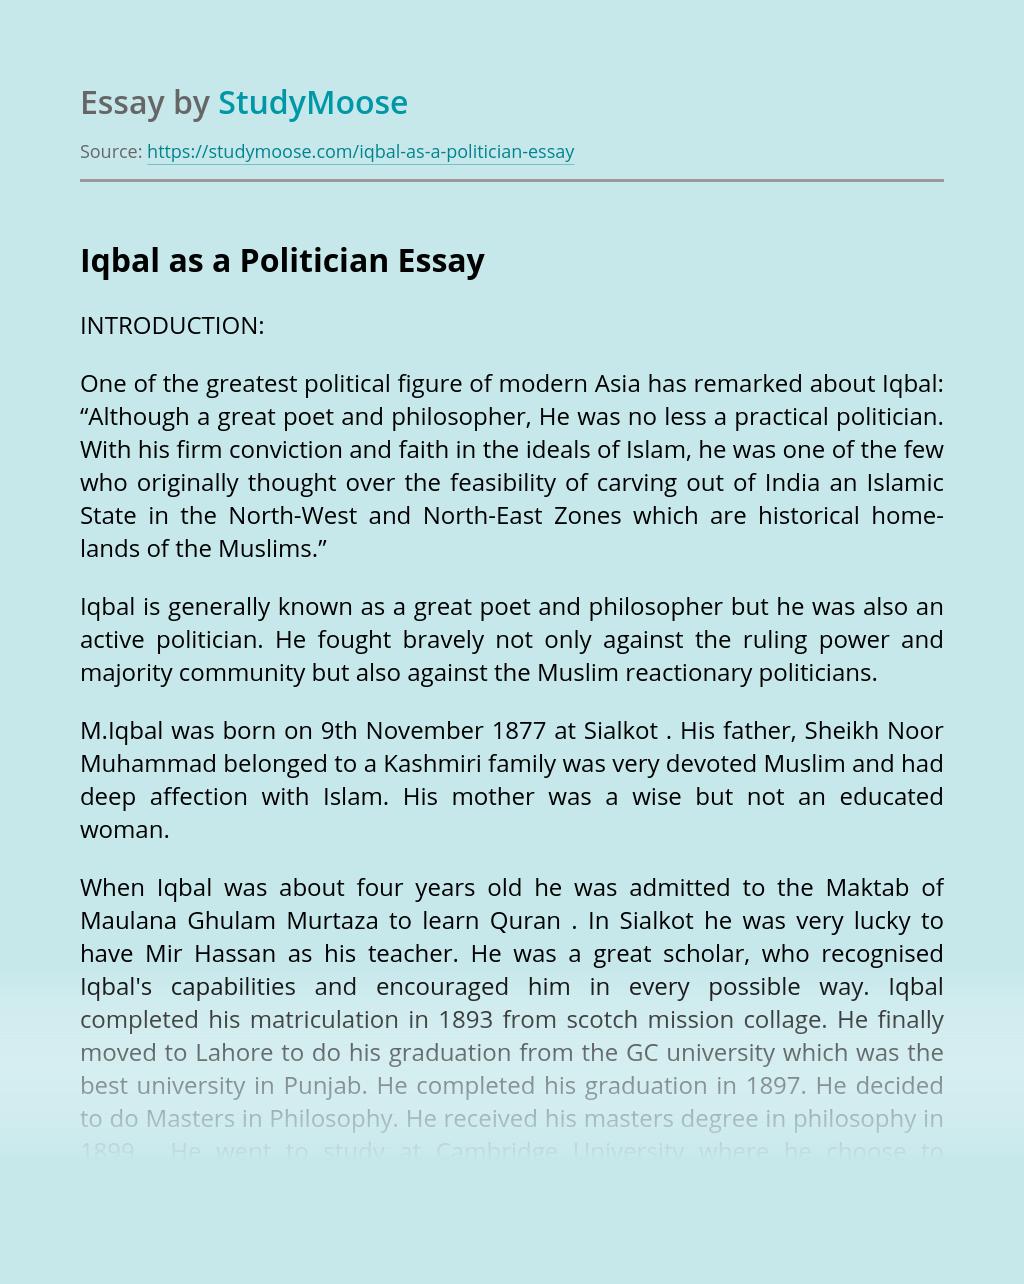 Iqbal as a Politician